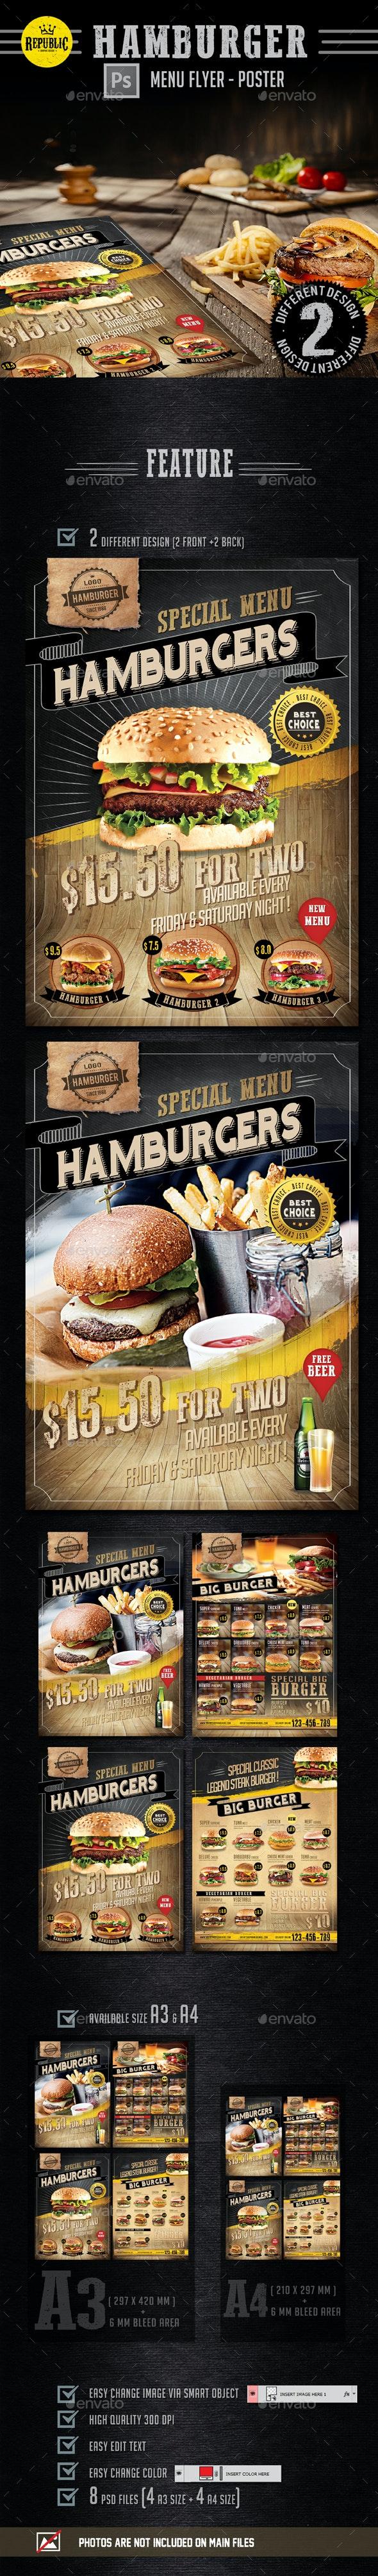 Hamburger Menu Flyer - Food Menus Print Templates